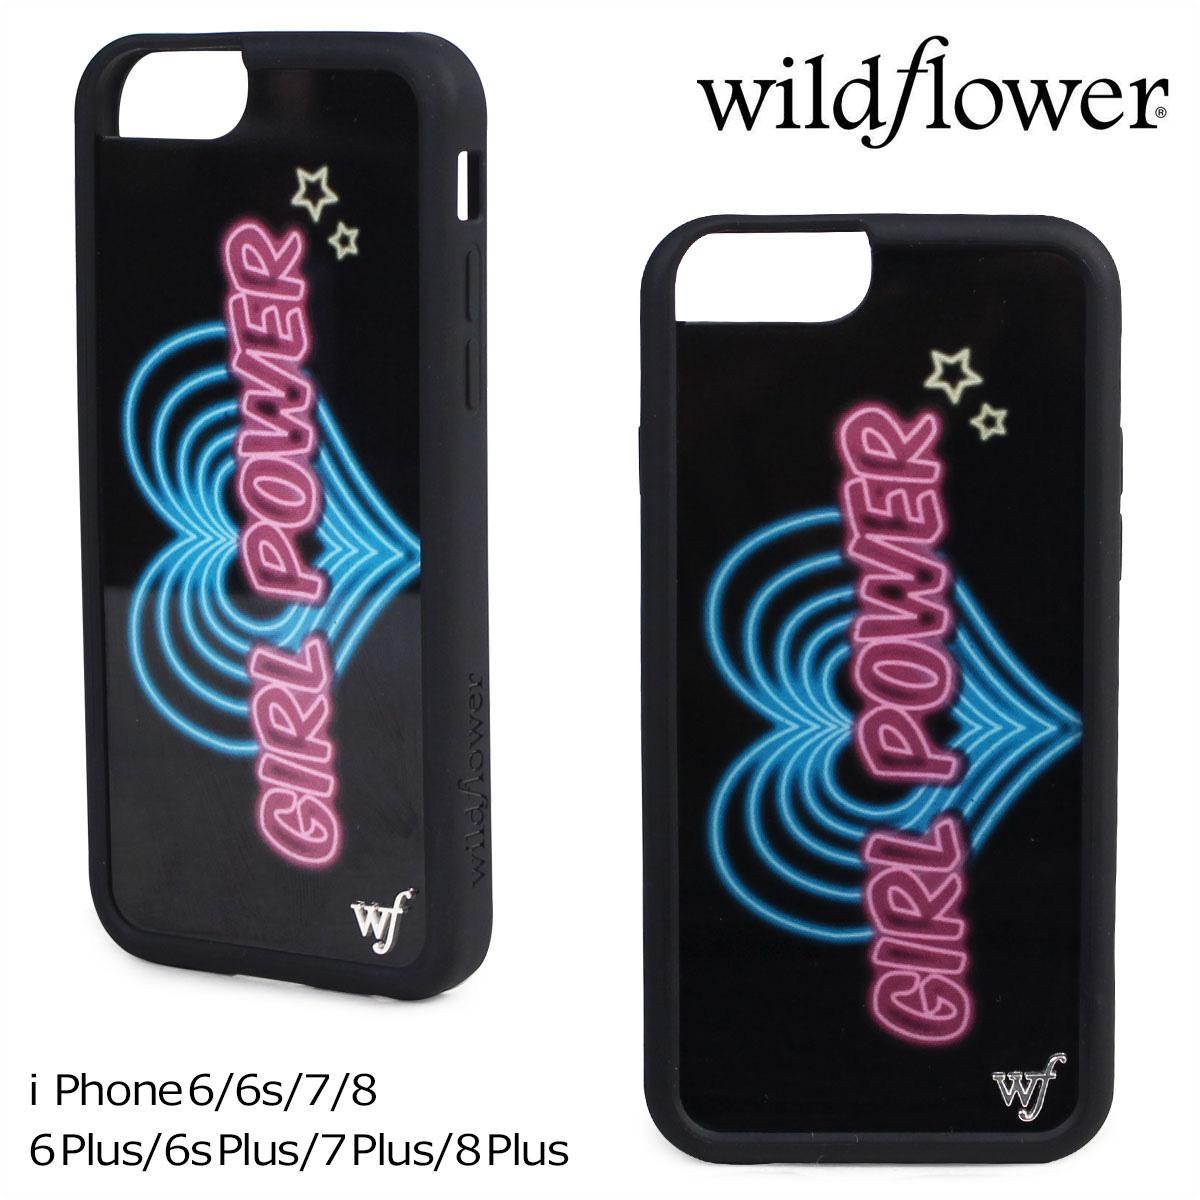 new style c4d1d 5ca94 wildflower iPhone8 7 iPhone 6 6s wild flower case smartphone eyephone  Lady's black GIRL